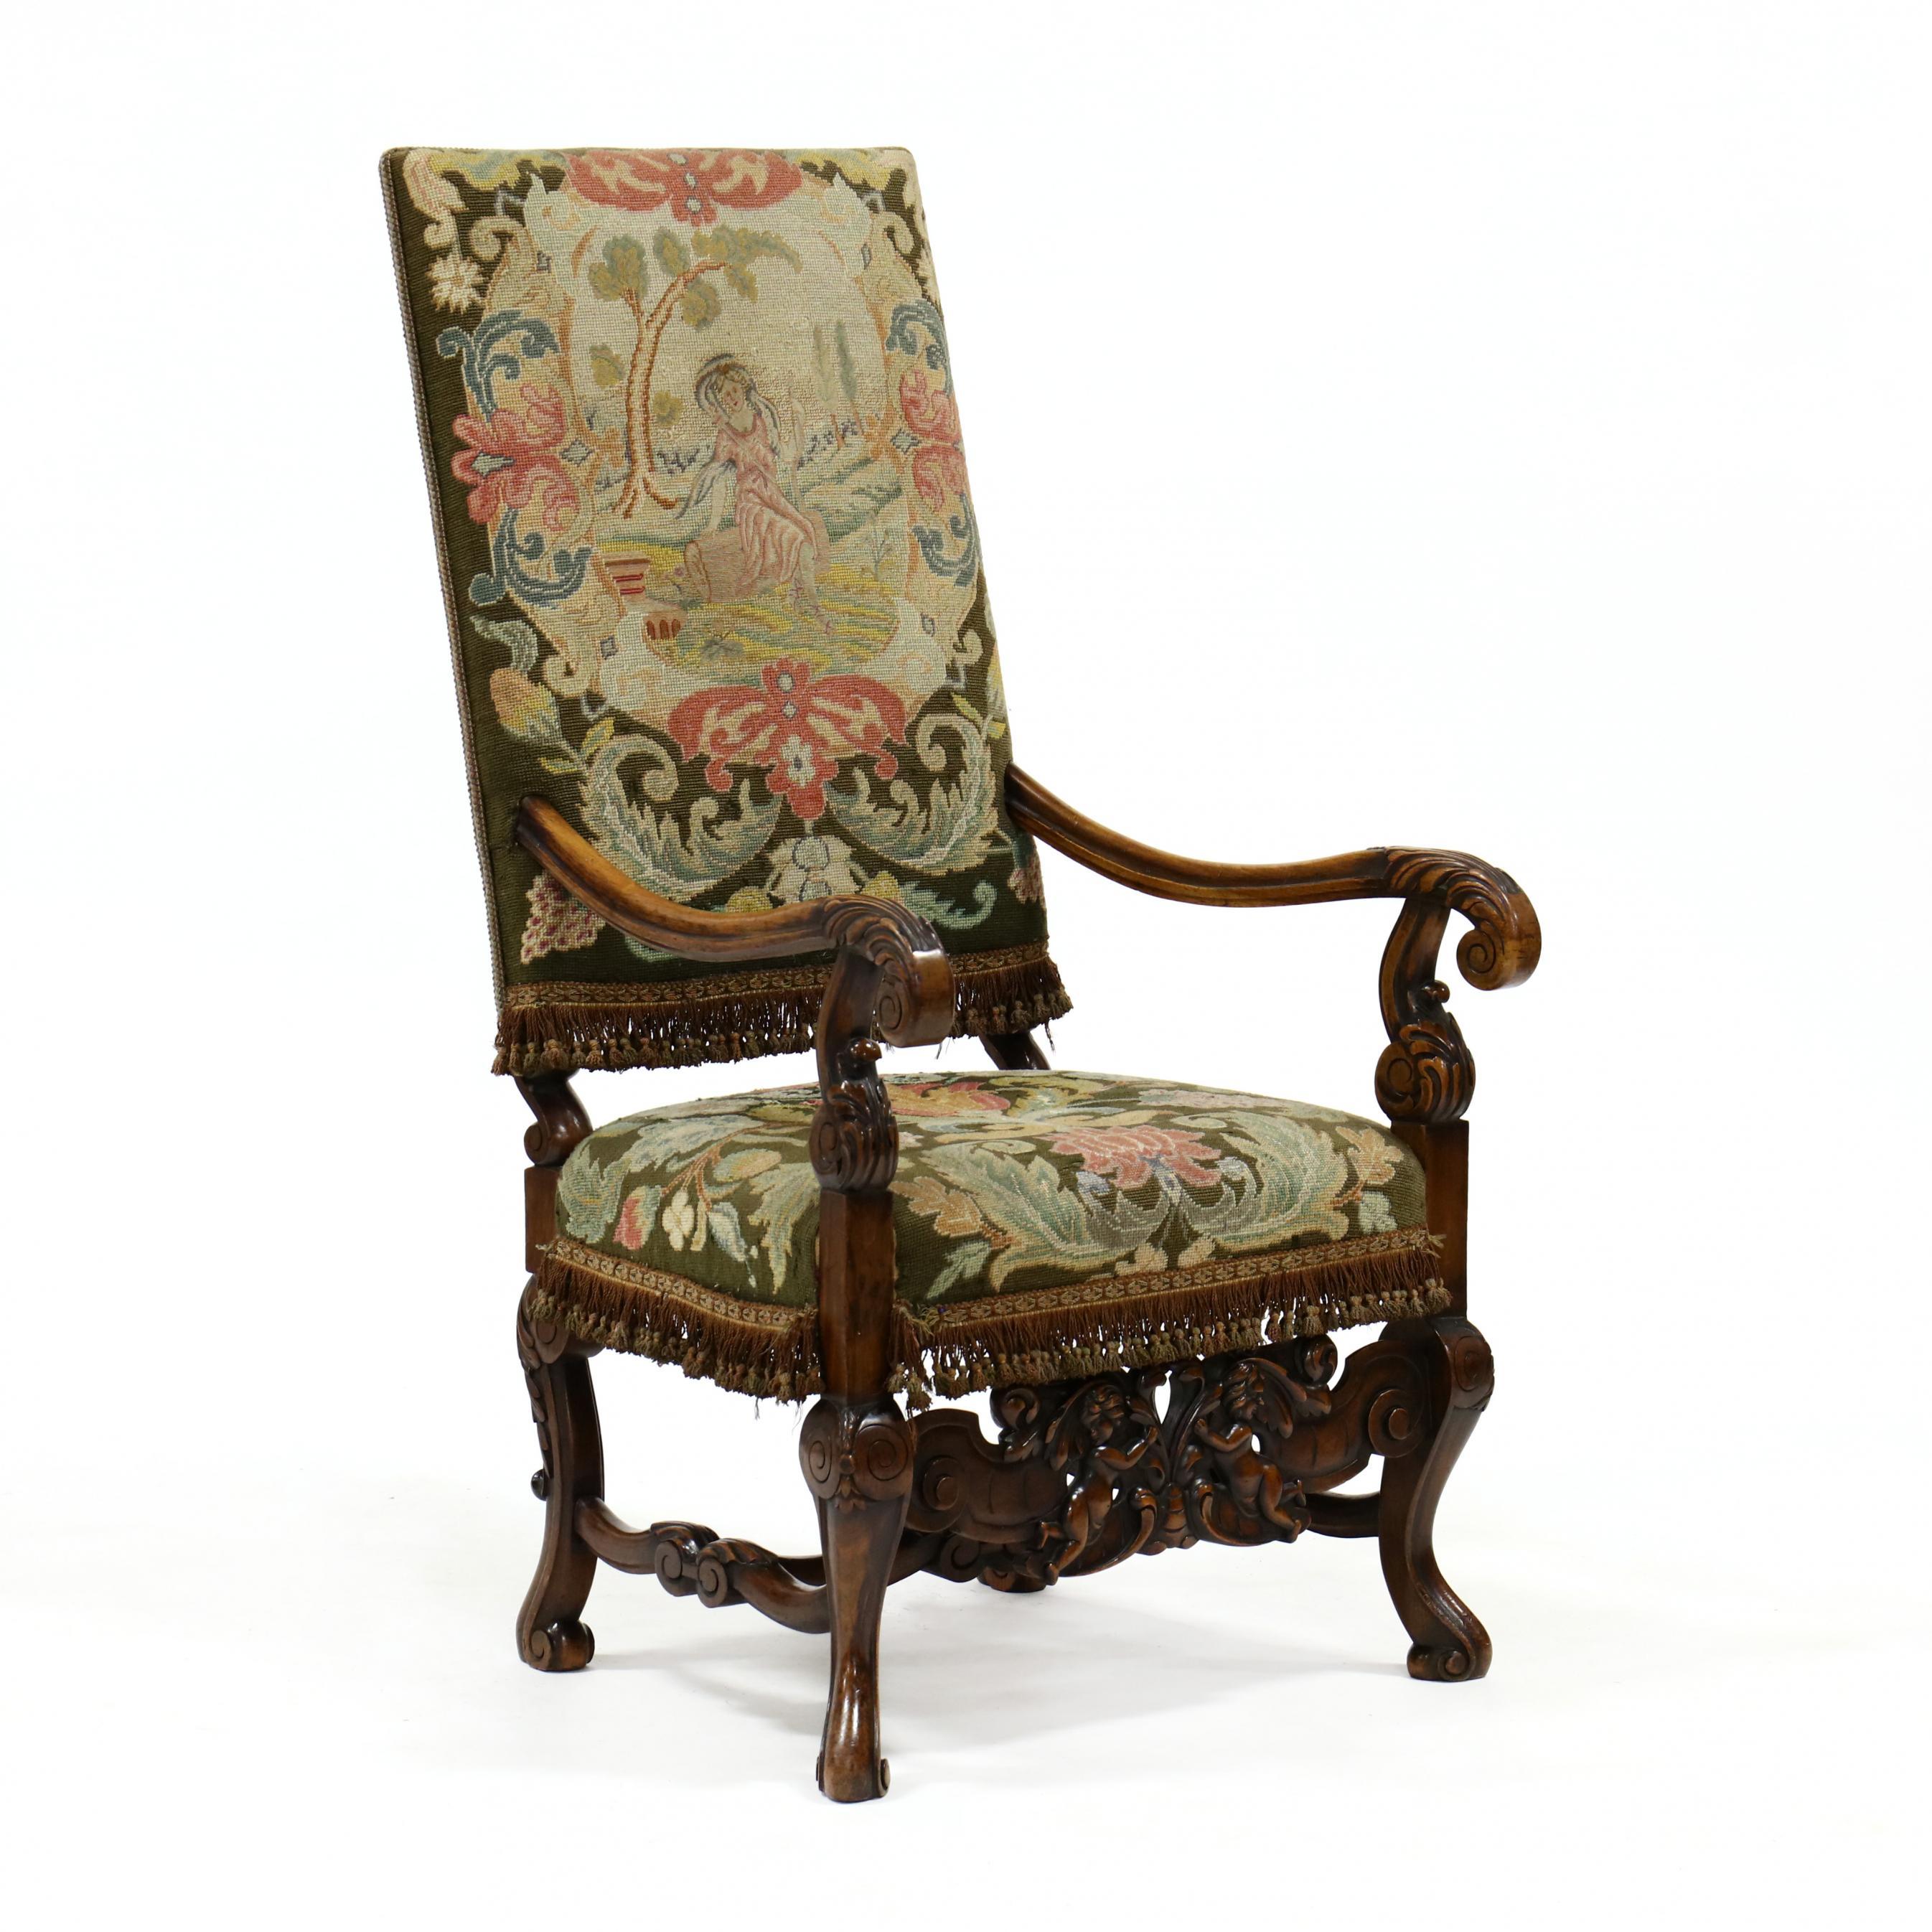 spanish-baroque-style-hall-chair